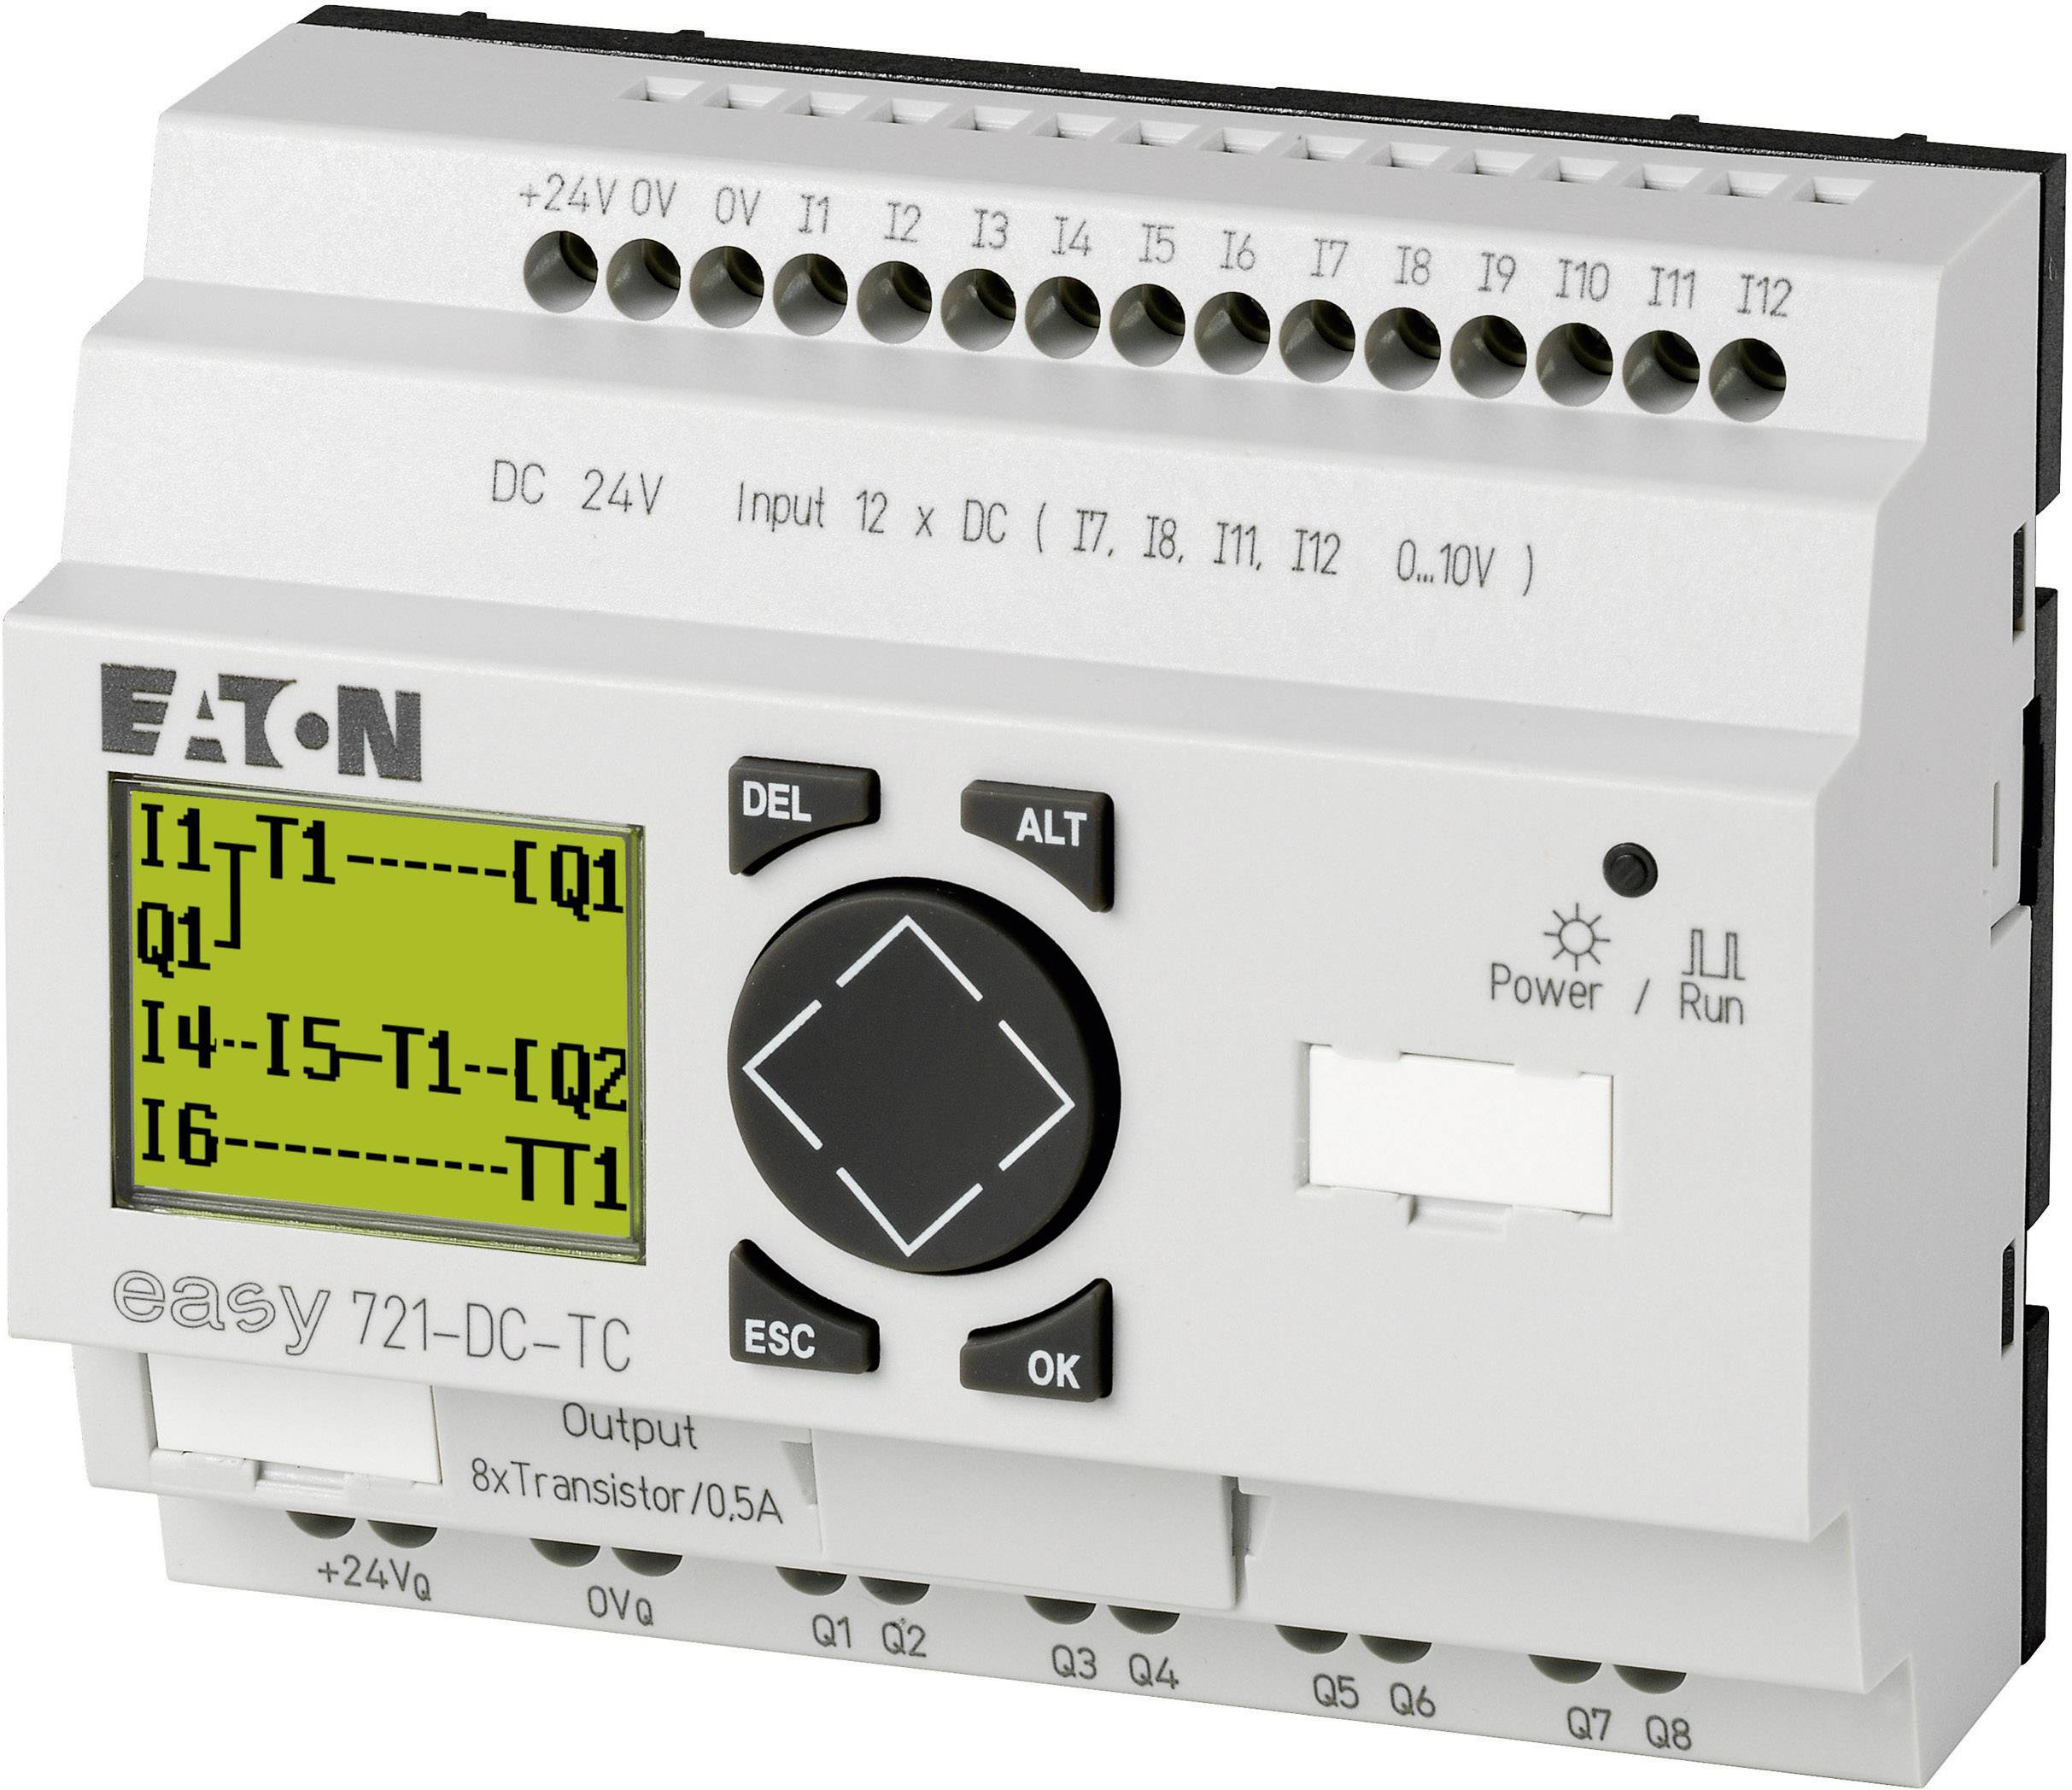 Riadiacimodul Eaton easy 721-DC-TC 274121, 24 V/DC